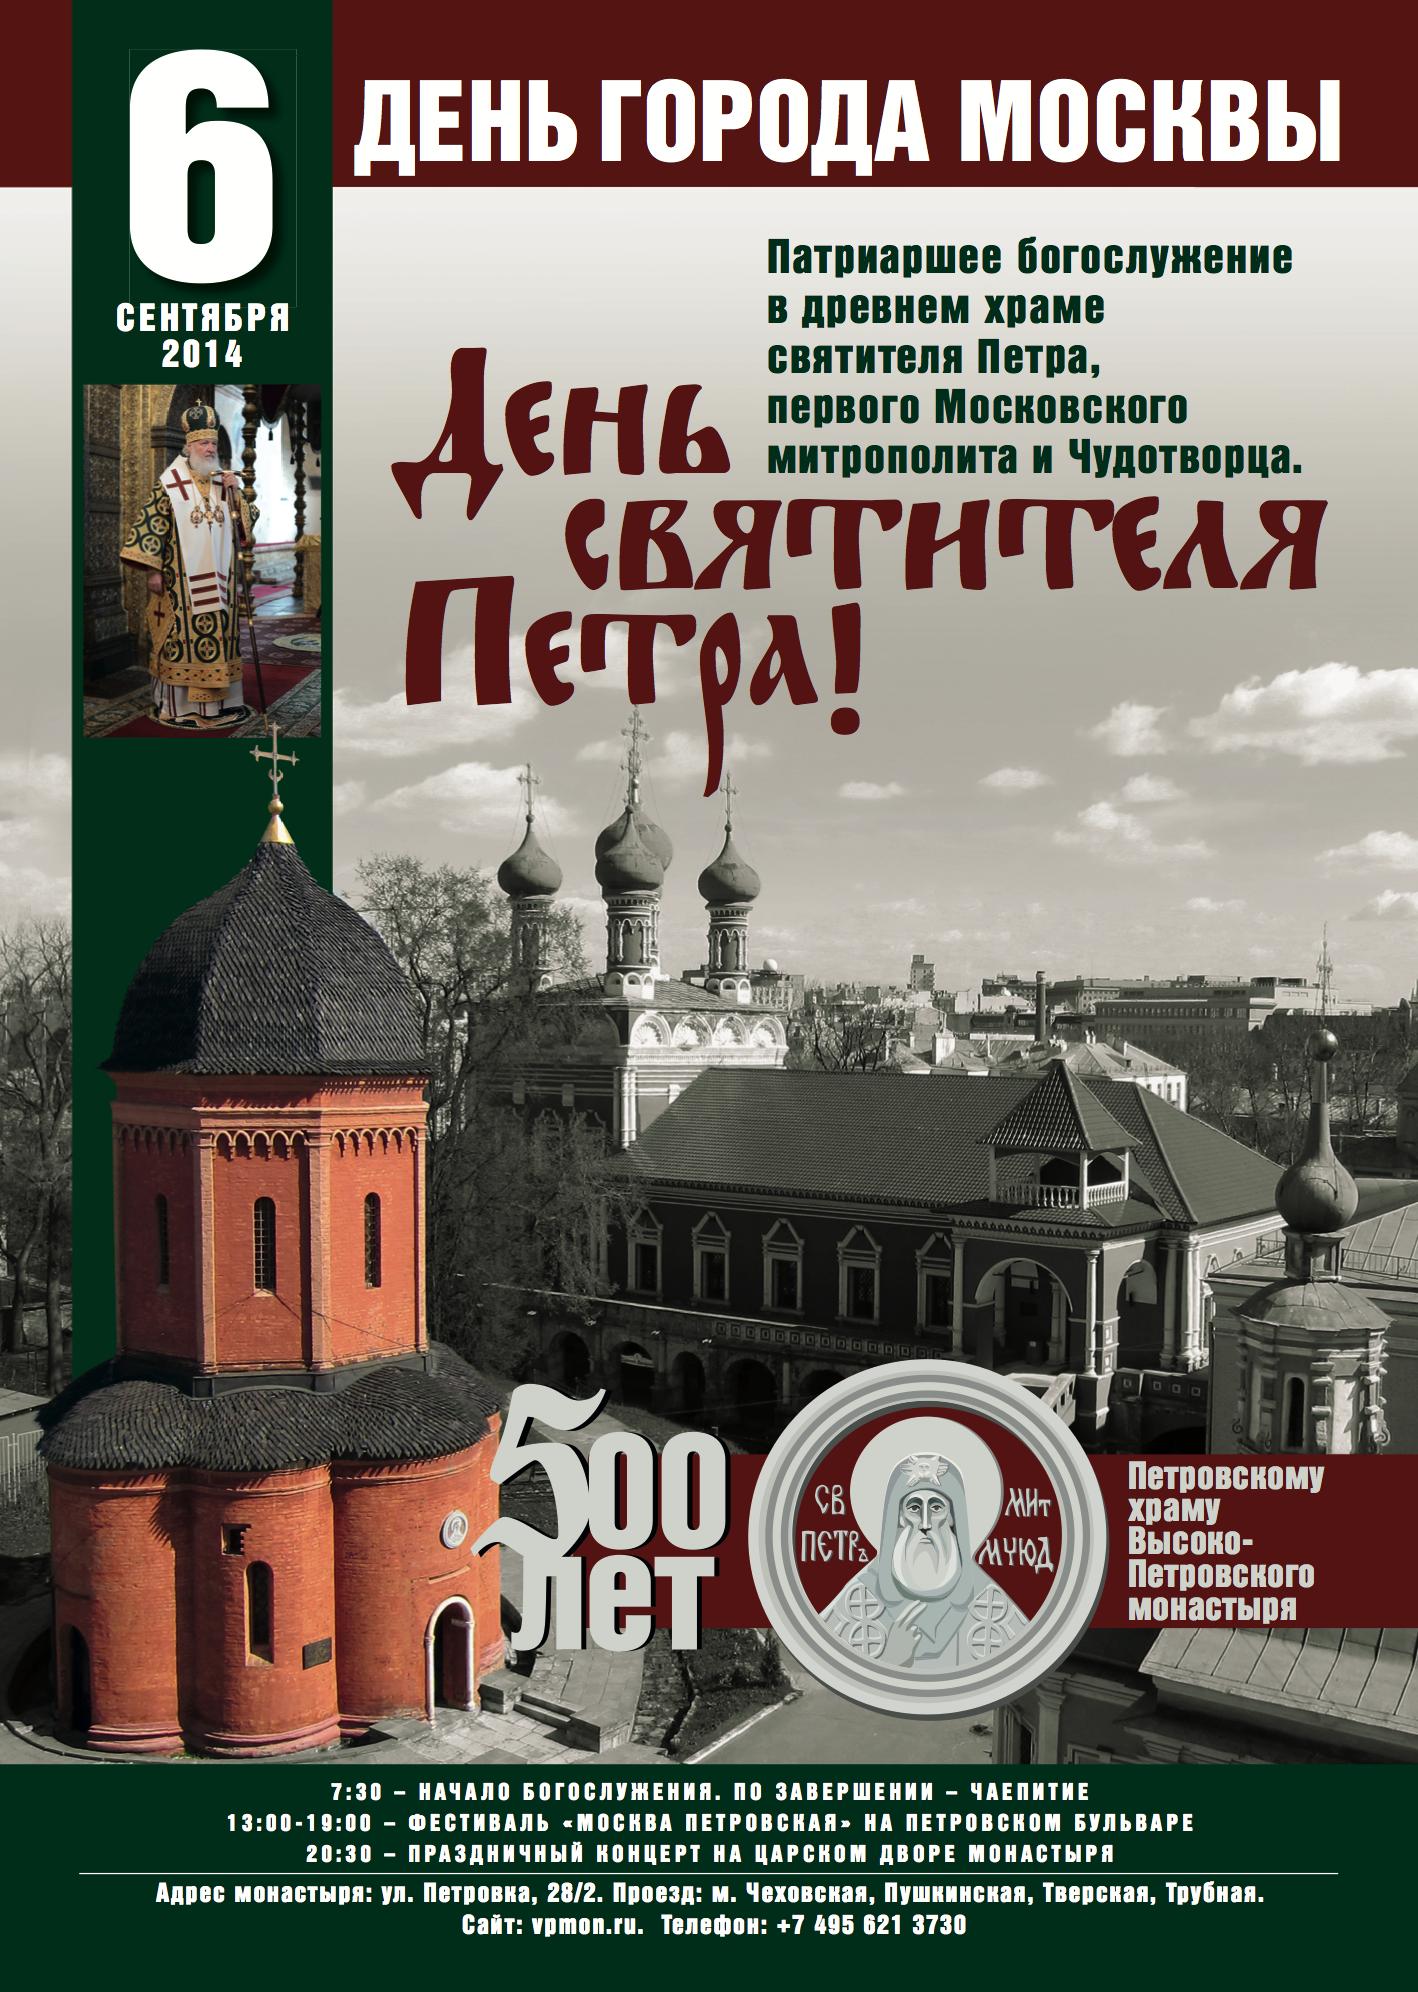 2014-08-28 16-35-08 St.Peter_A3_7.30_vert.for print.pdf (1 страница)